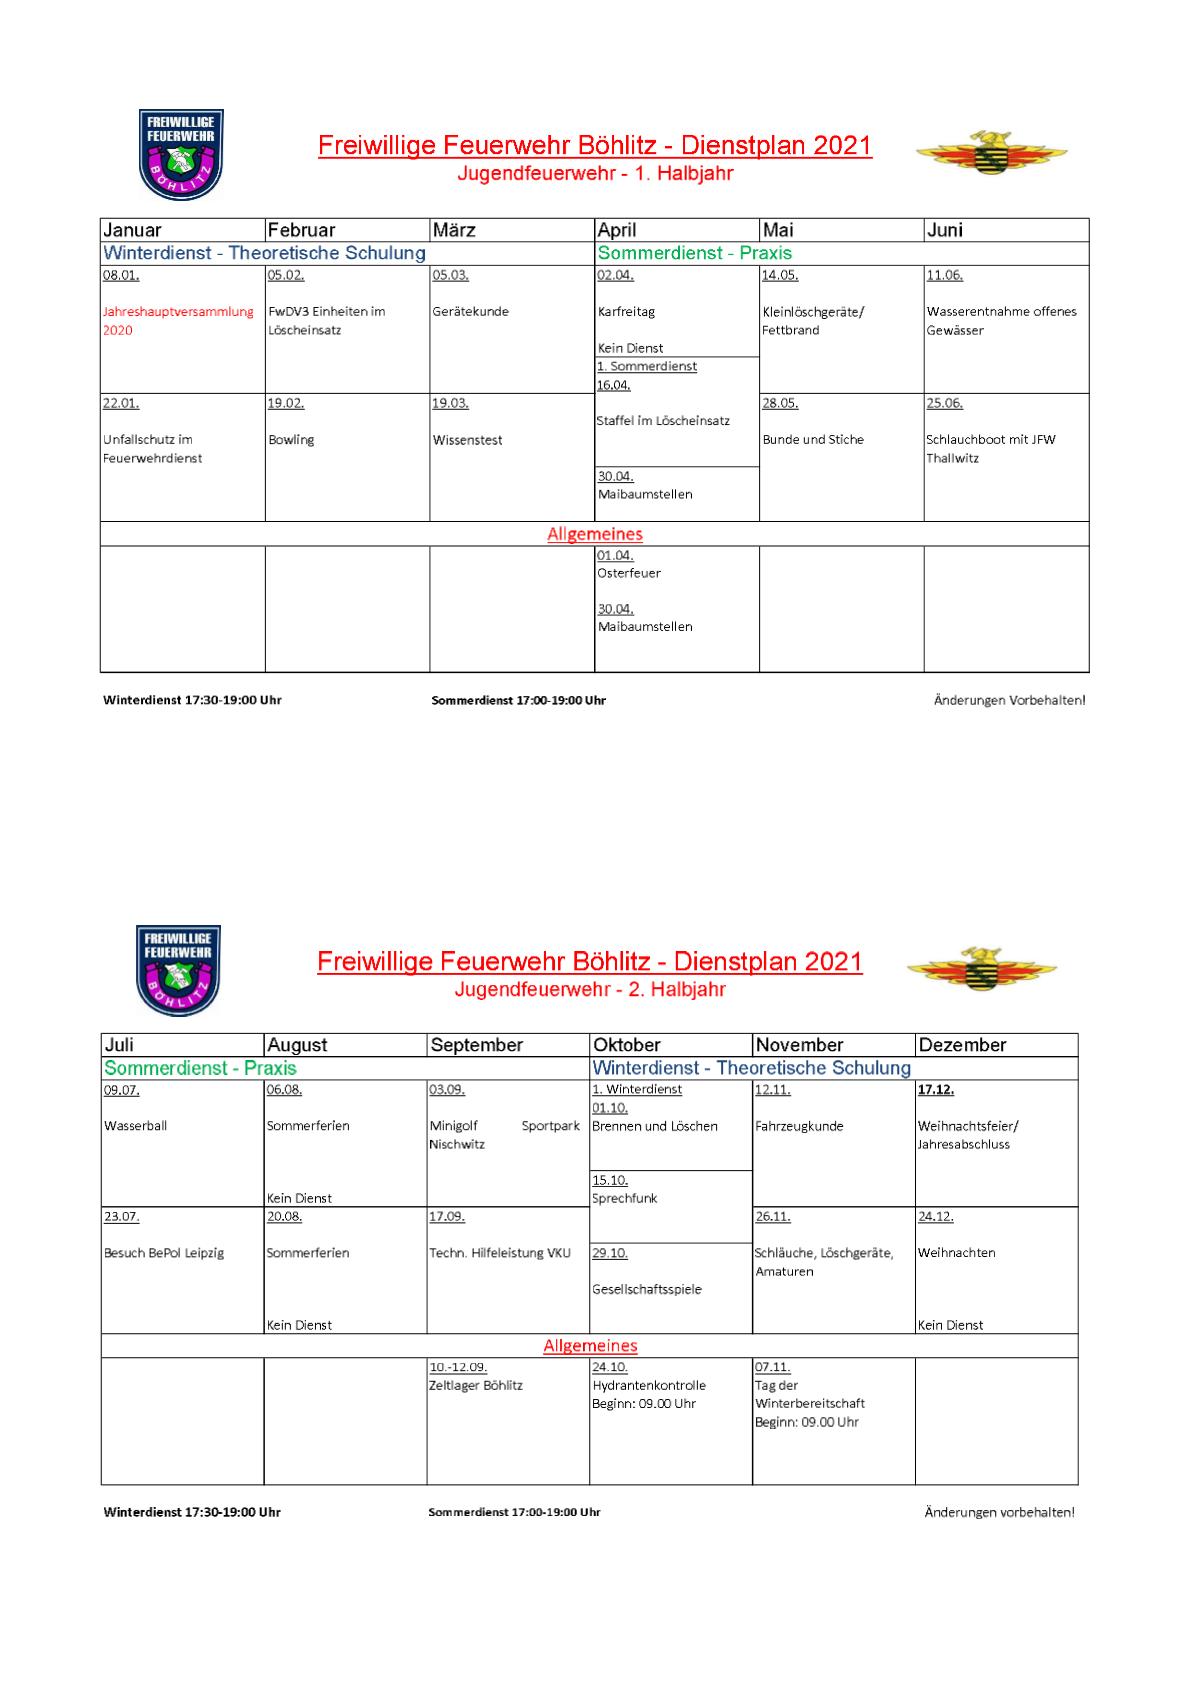 Dienstplan 21 JFW